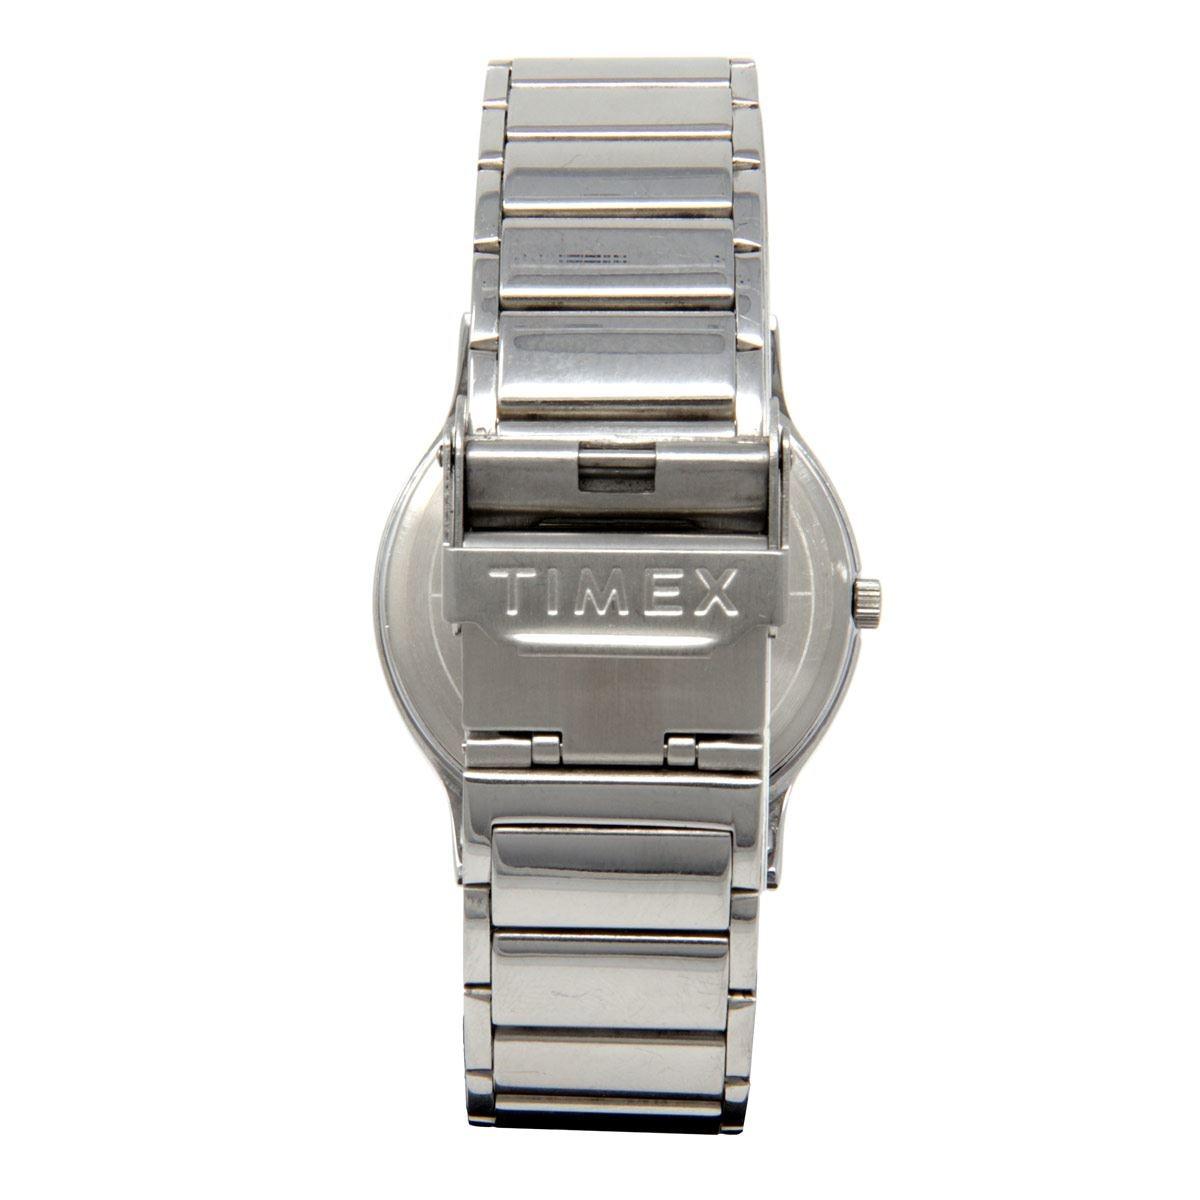 Reloj Timex Plateado TW2U39300 Para Caballero